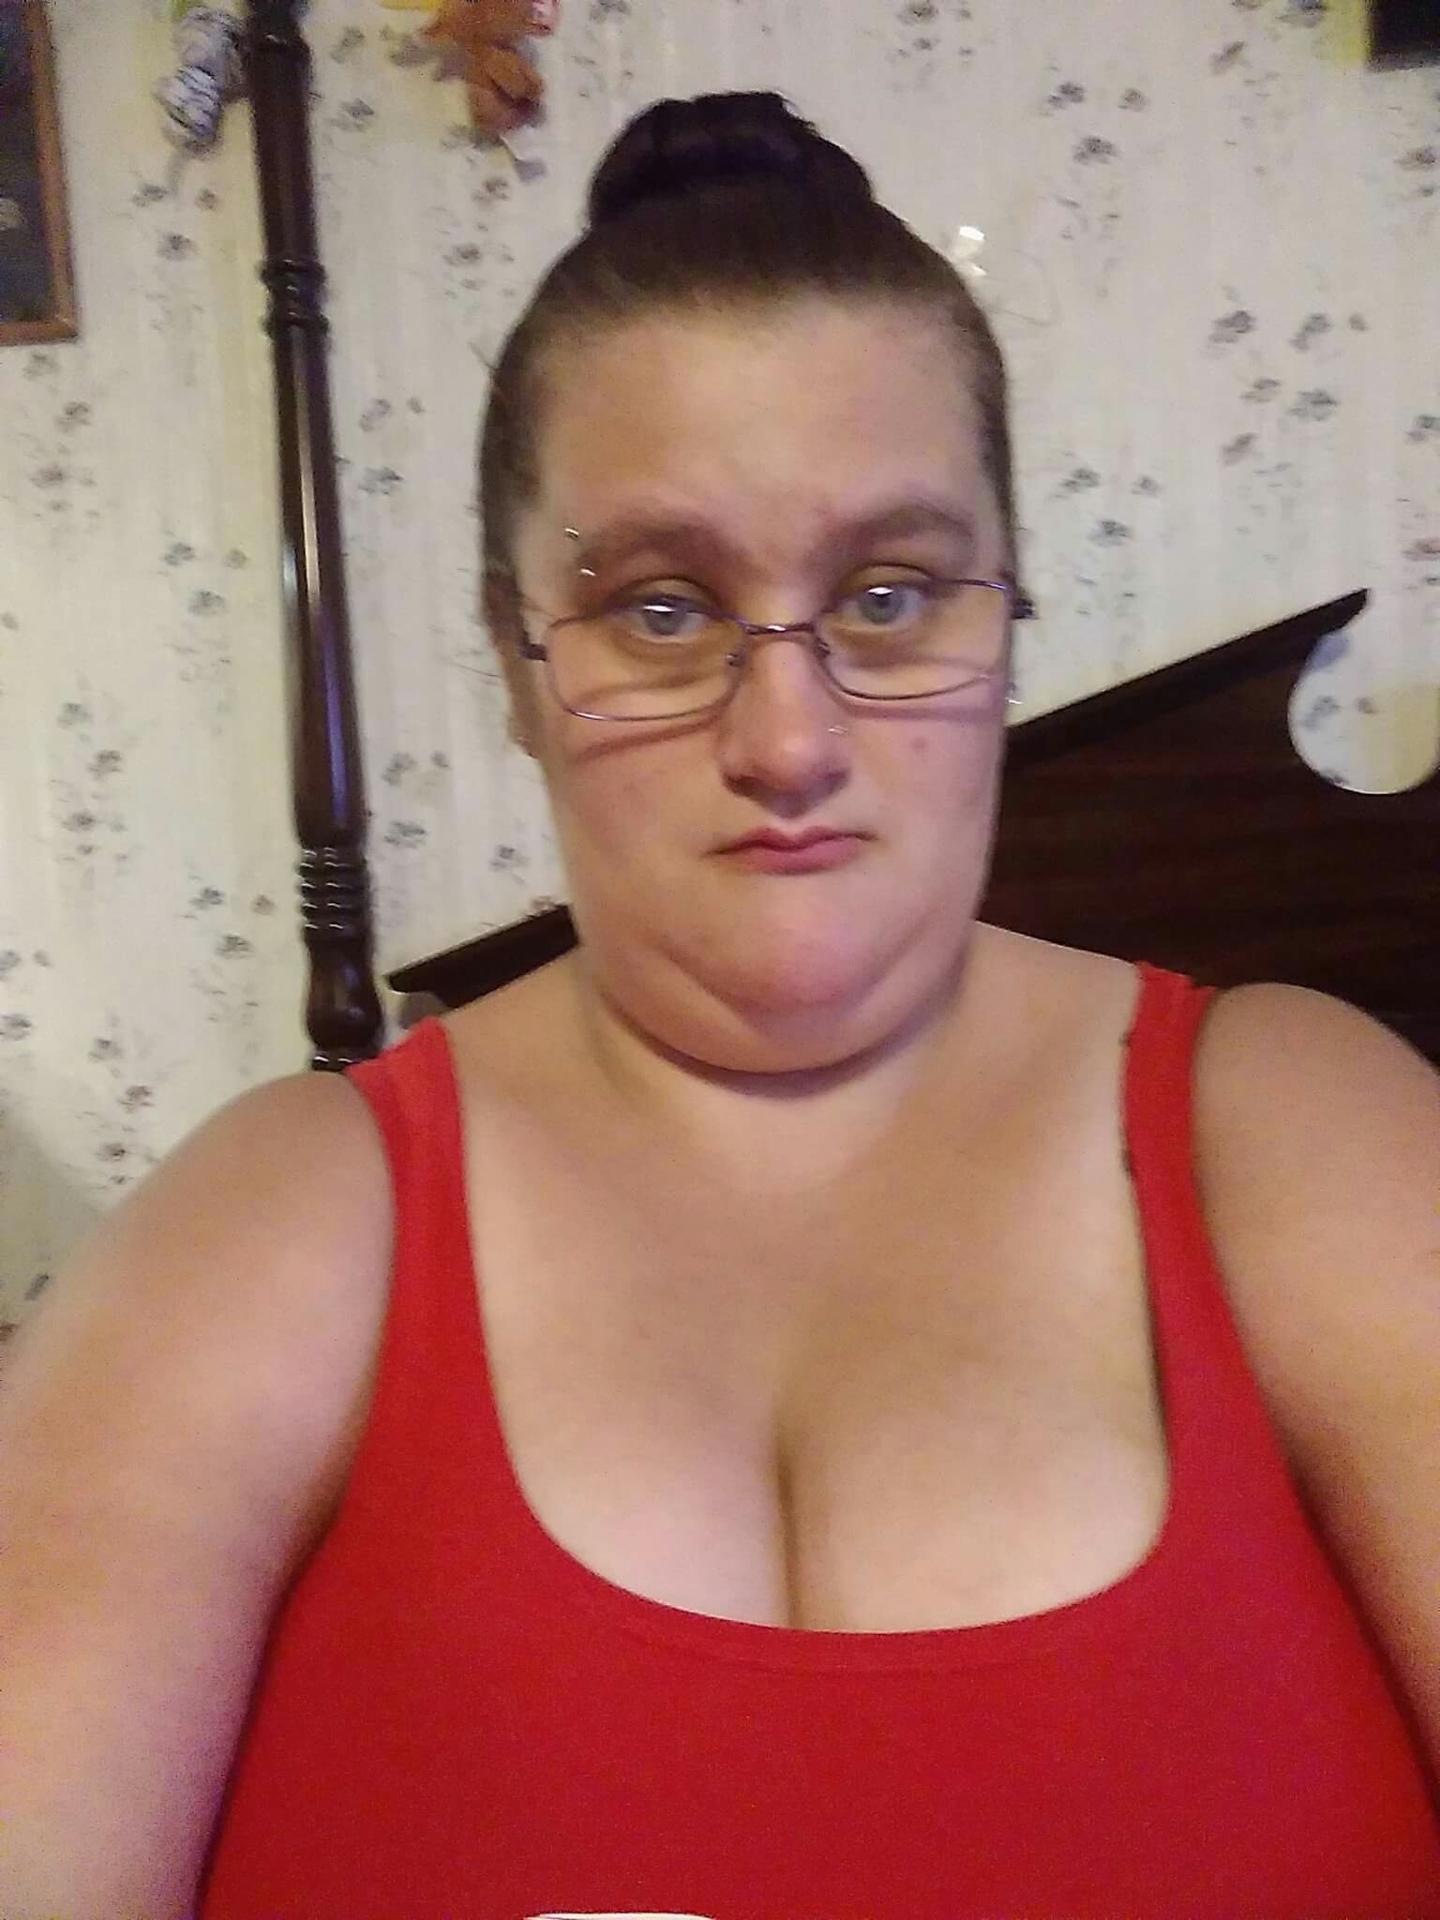 yoga, rock Beste Dating Webseiten für über 40 Männer Selfies Psychopath me. dirty cock hungry